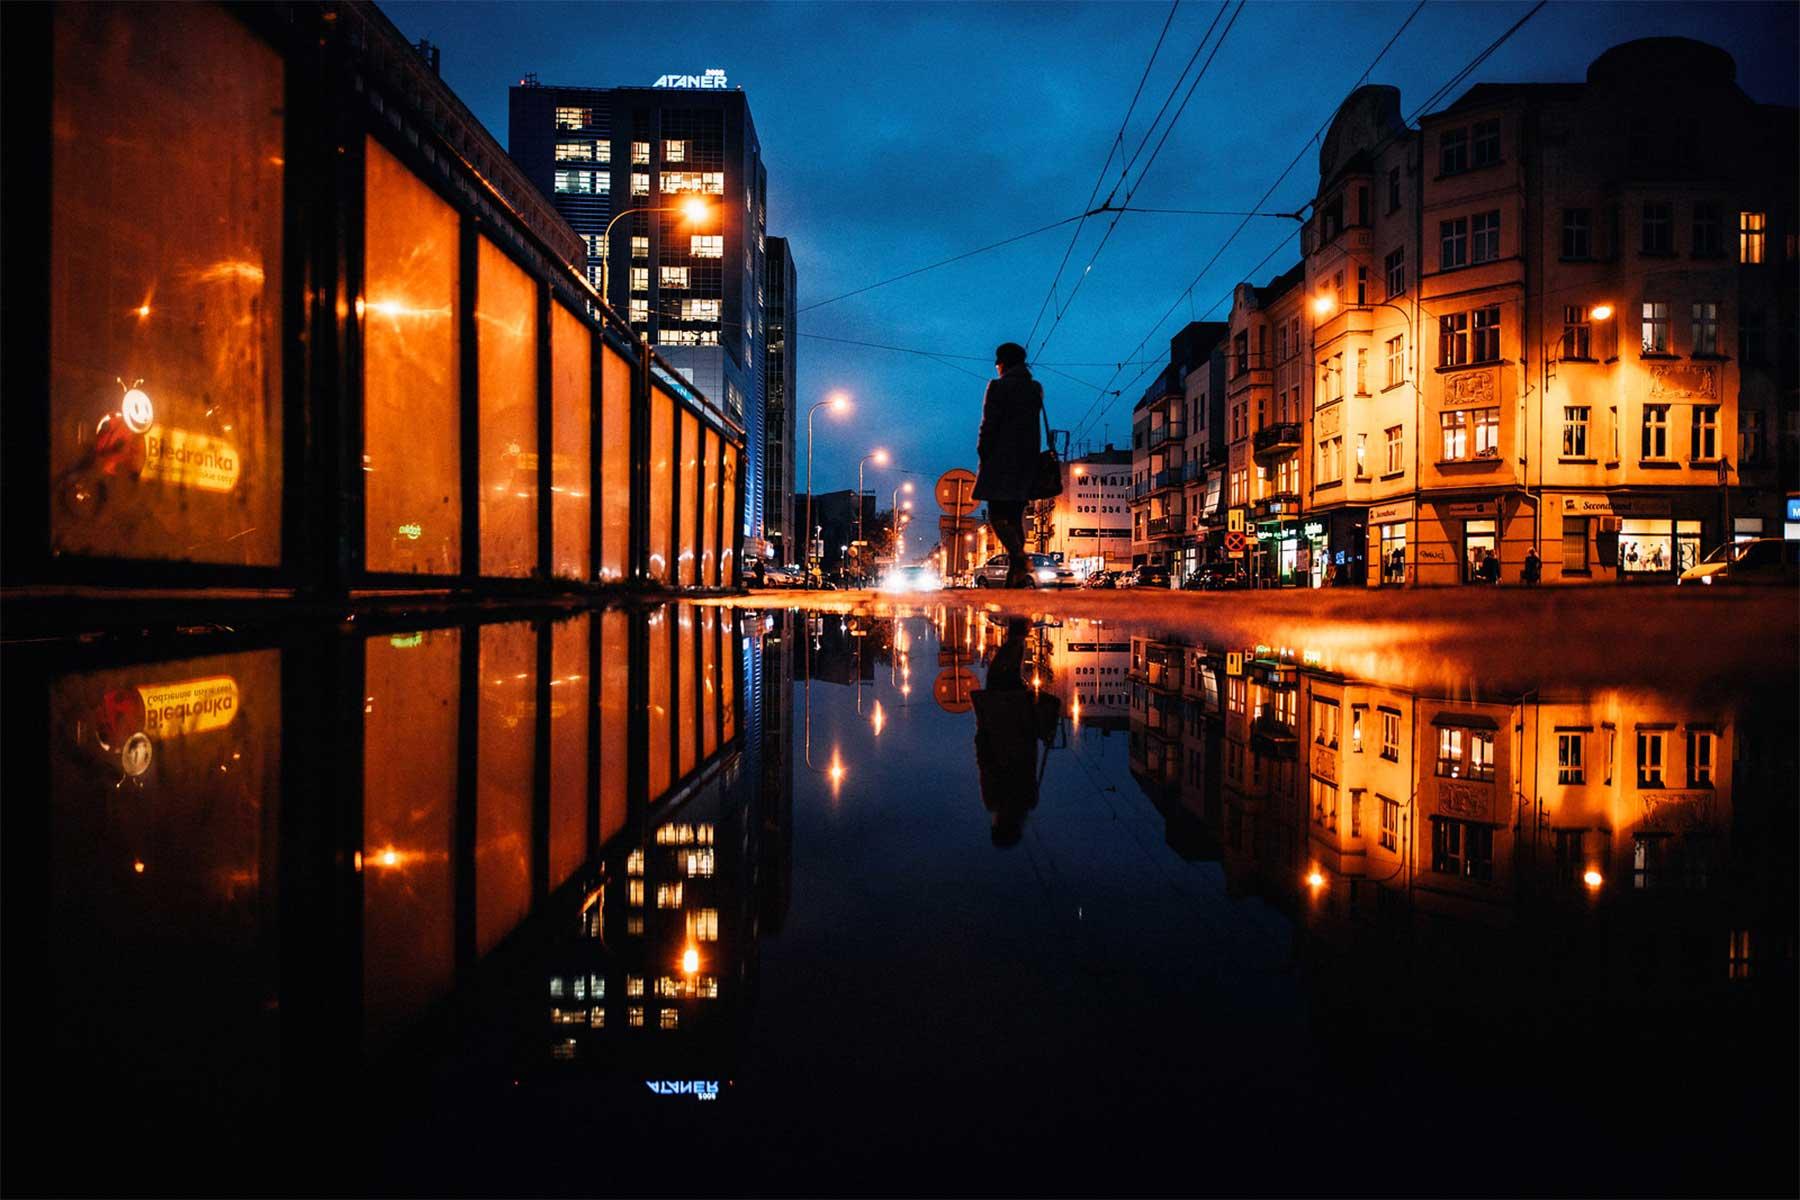 Fotografie von Erik Witsoe Erik-Witsoe-street-photography_03